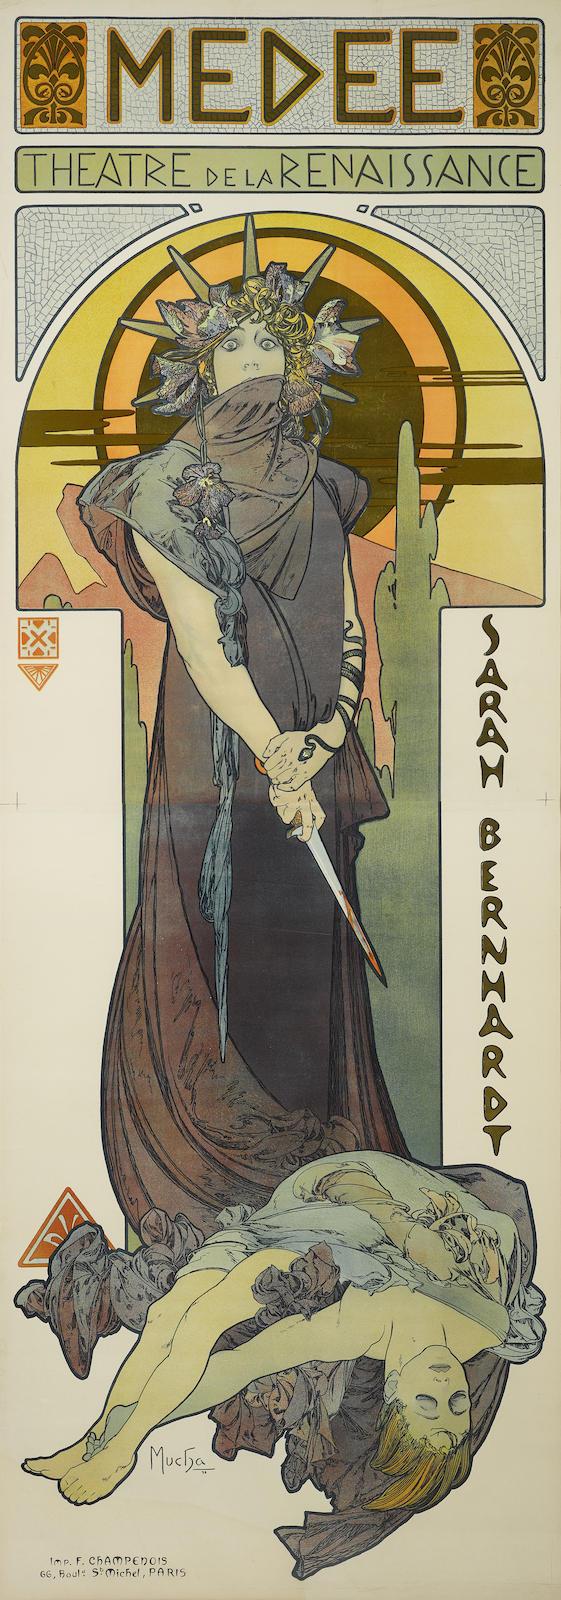 Alphonse Mucha-Medeemedee (R./W. 53)-1898